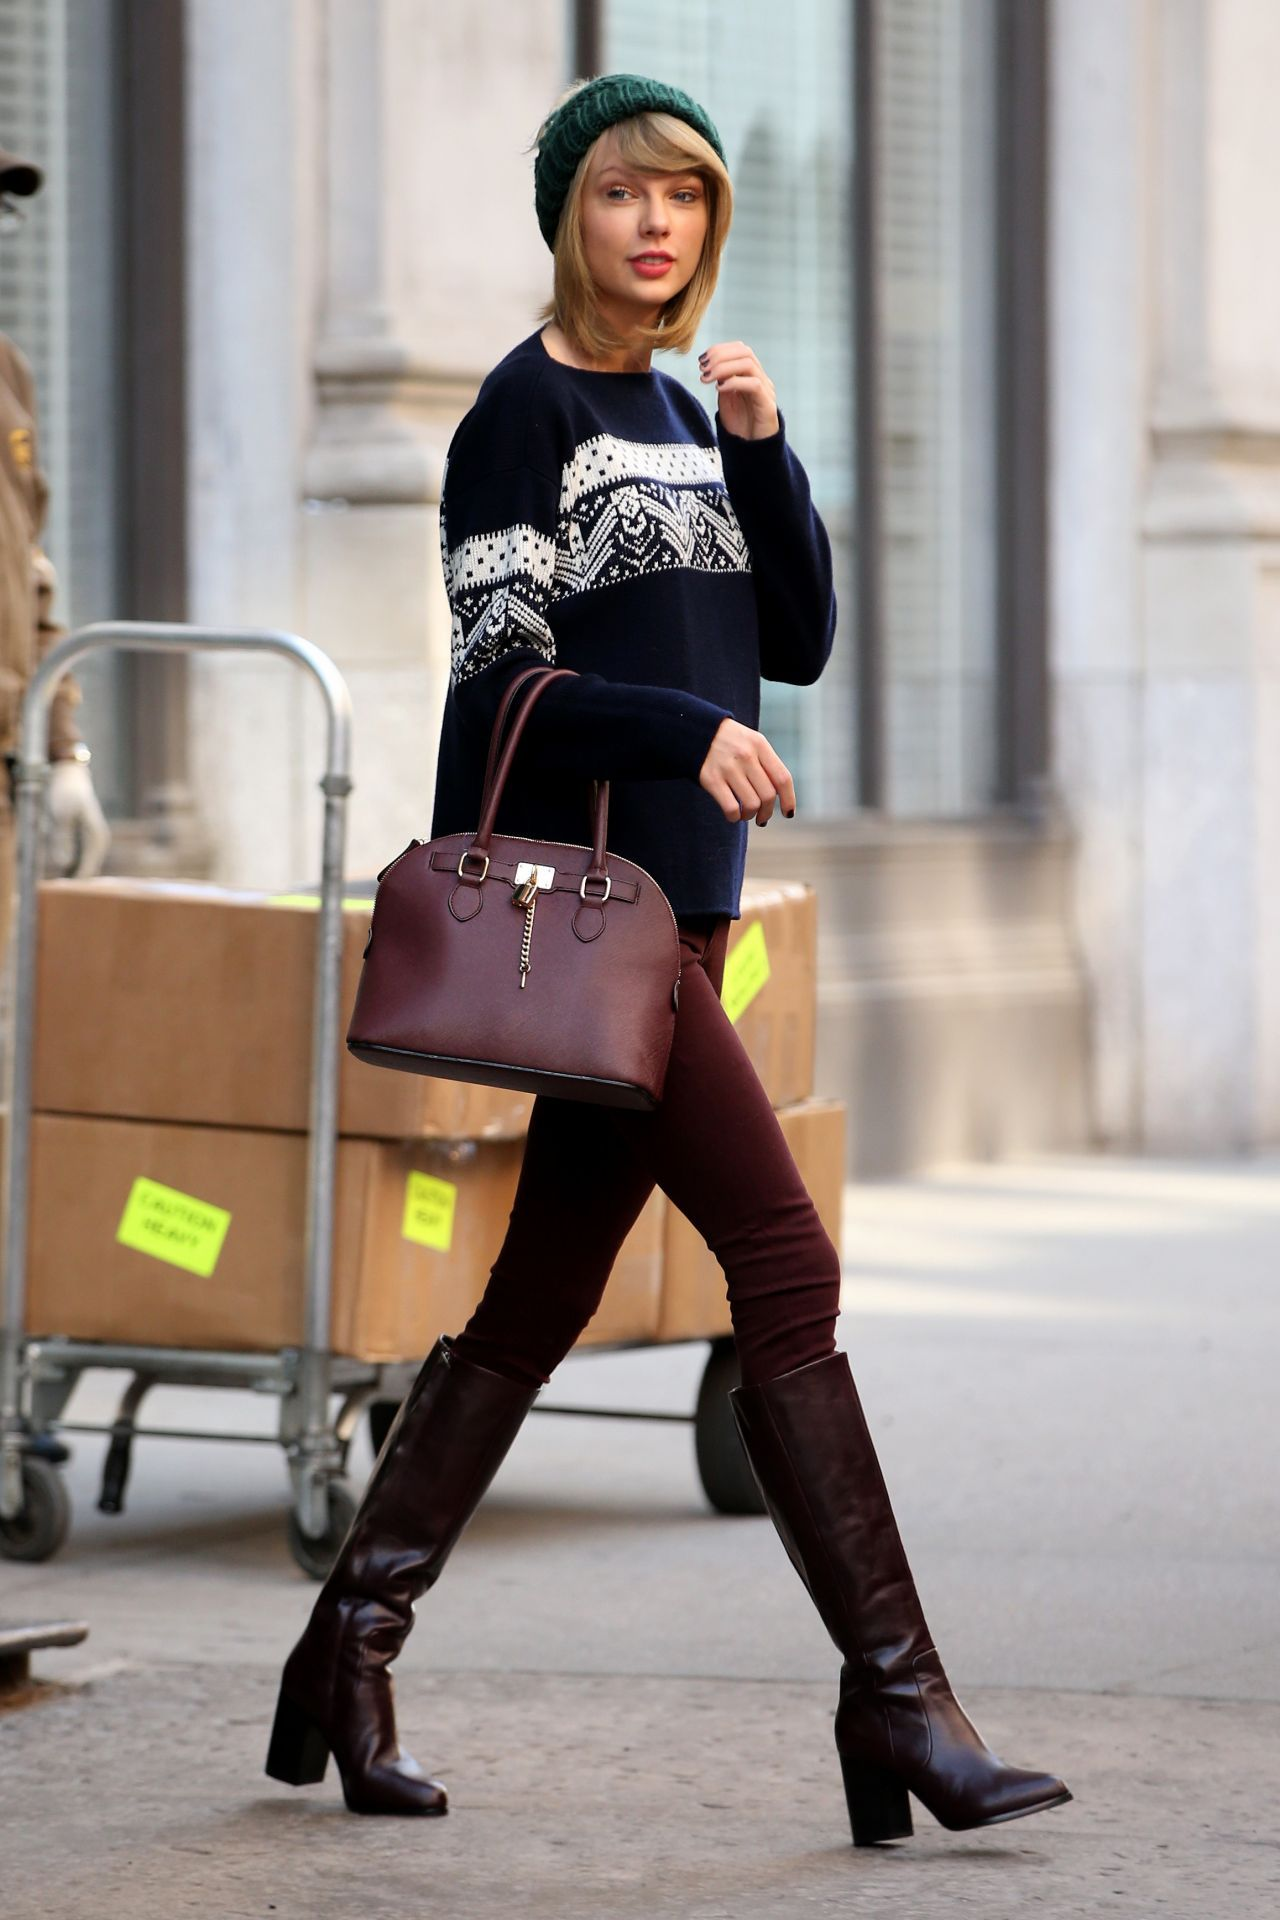 Taylor Swift Latest Photos - CelebMafia | Taylor swift ...